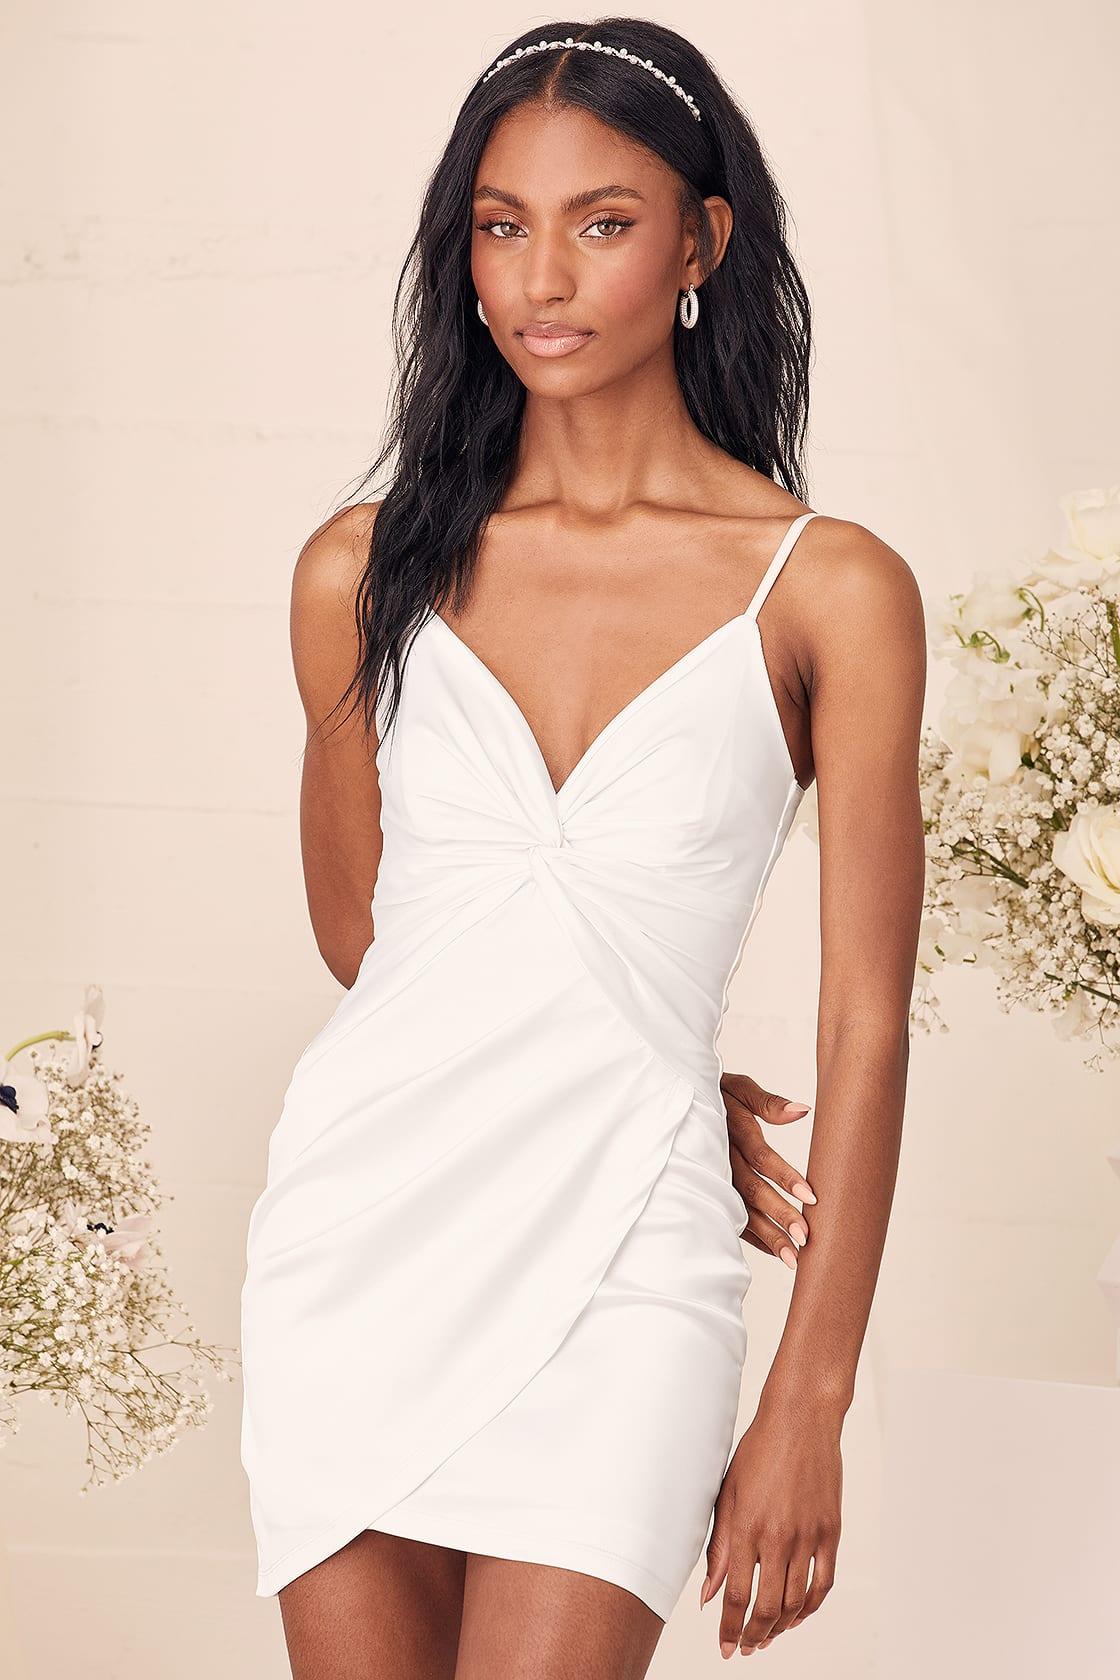 Shirt twisted white graduation dress